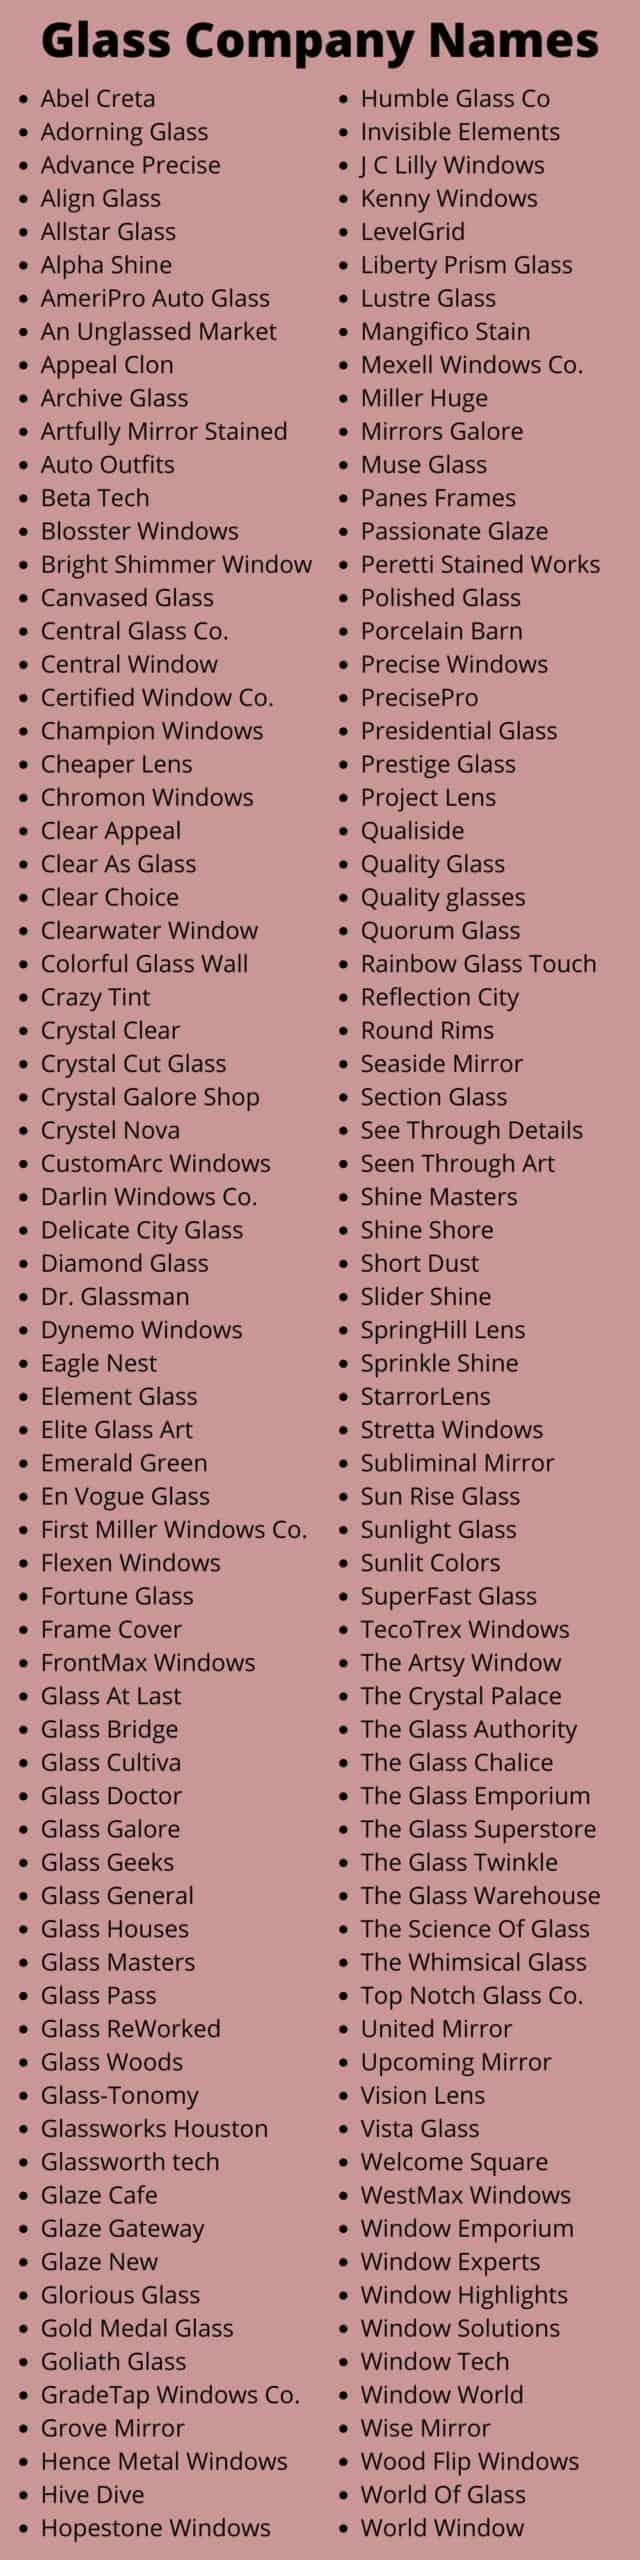 Glass Company Names